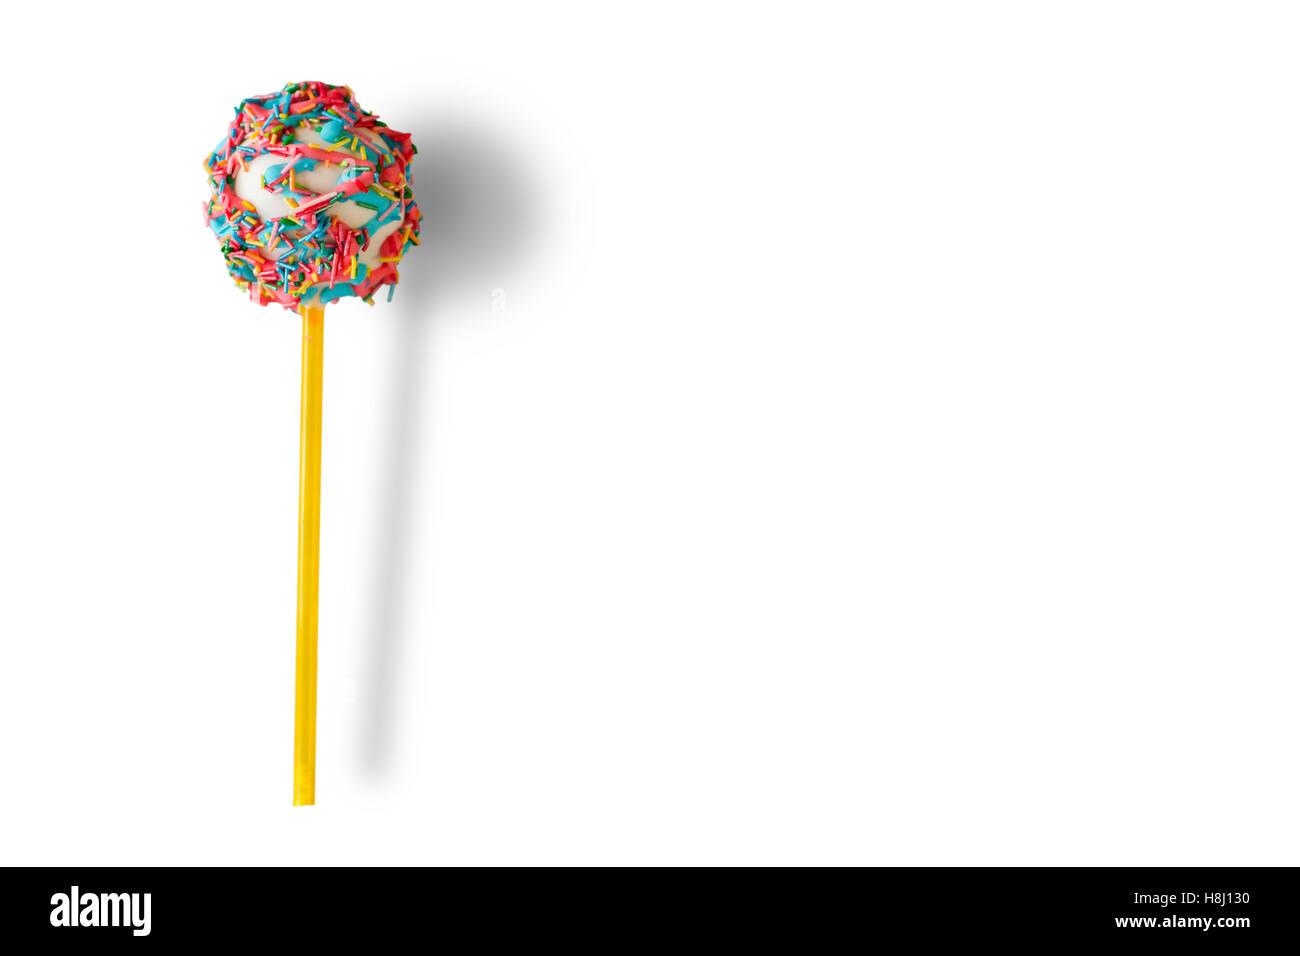 Cake pop with sprinkles. - Stock Image